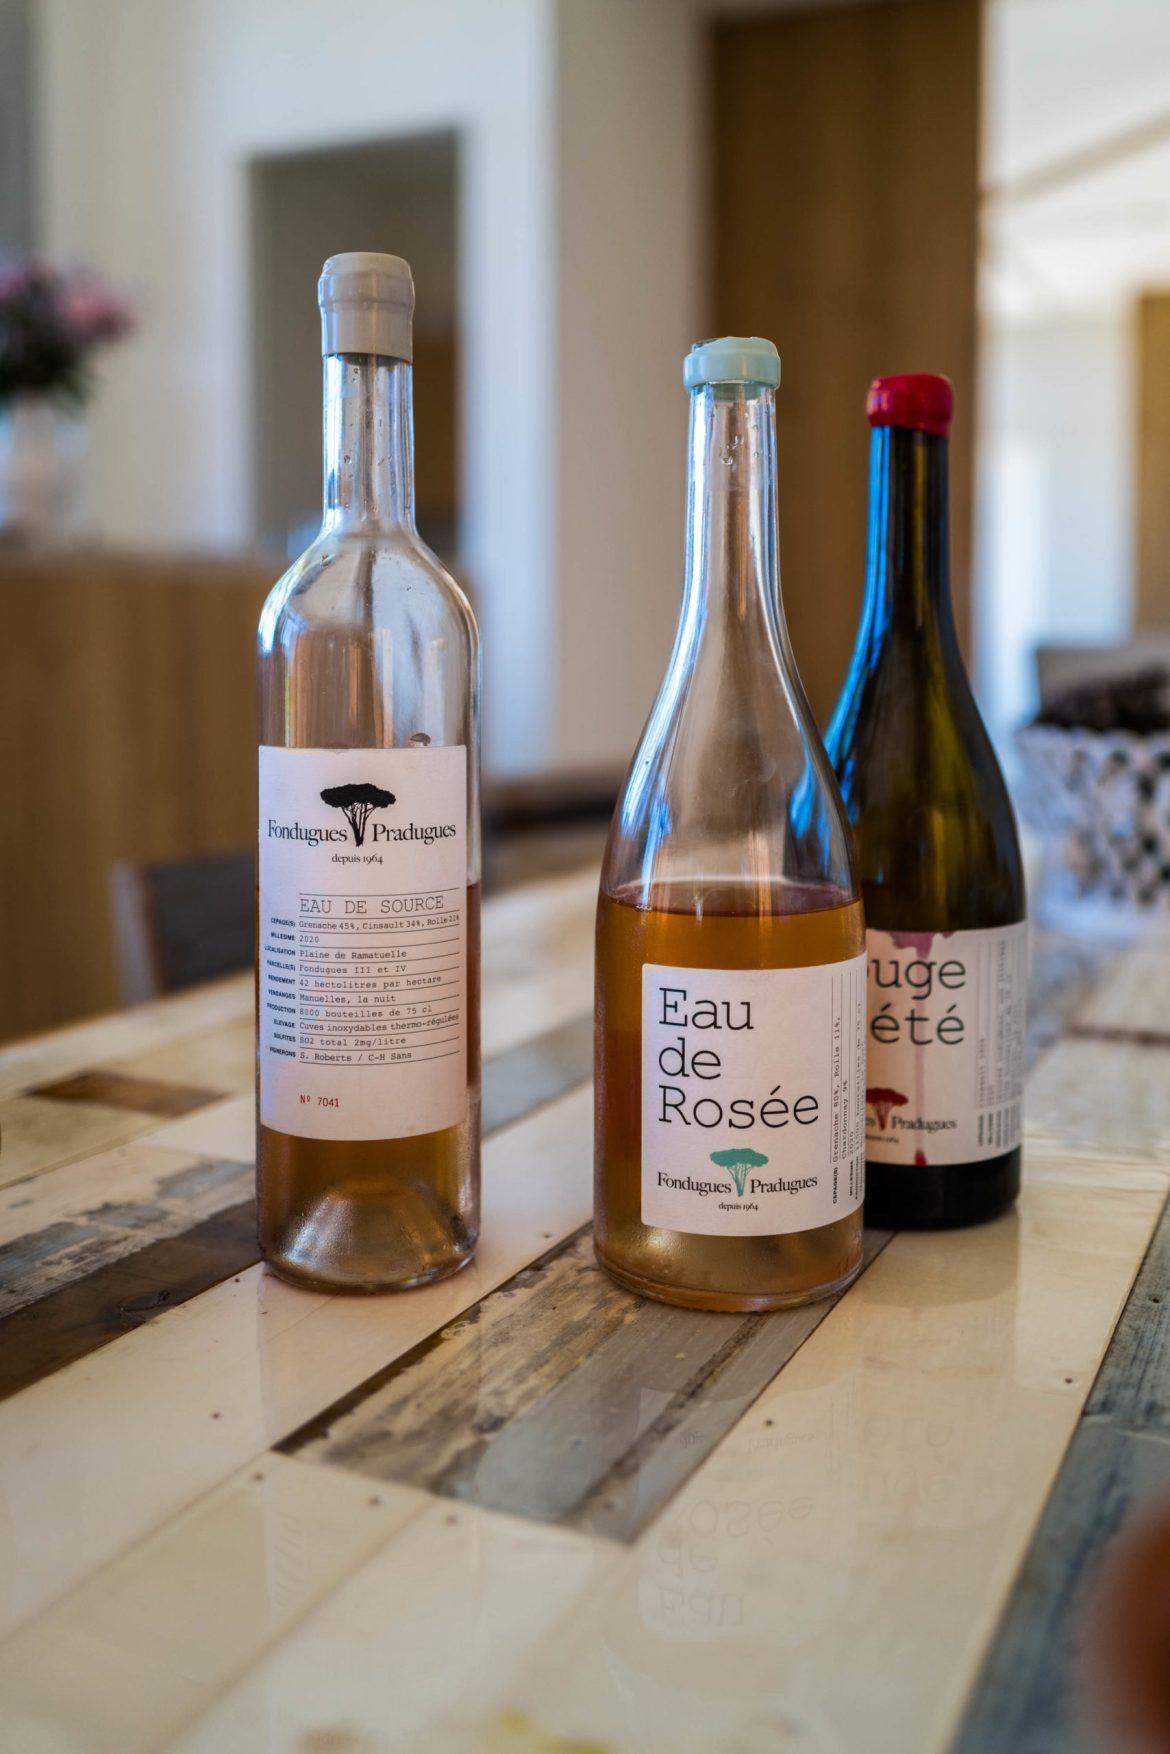 Natural winery in St Tropez France at Fondugues Pradugues